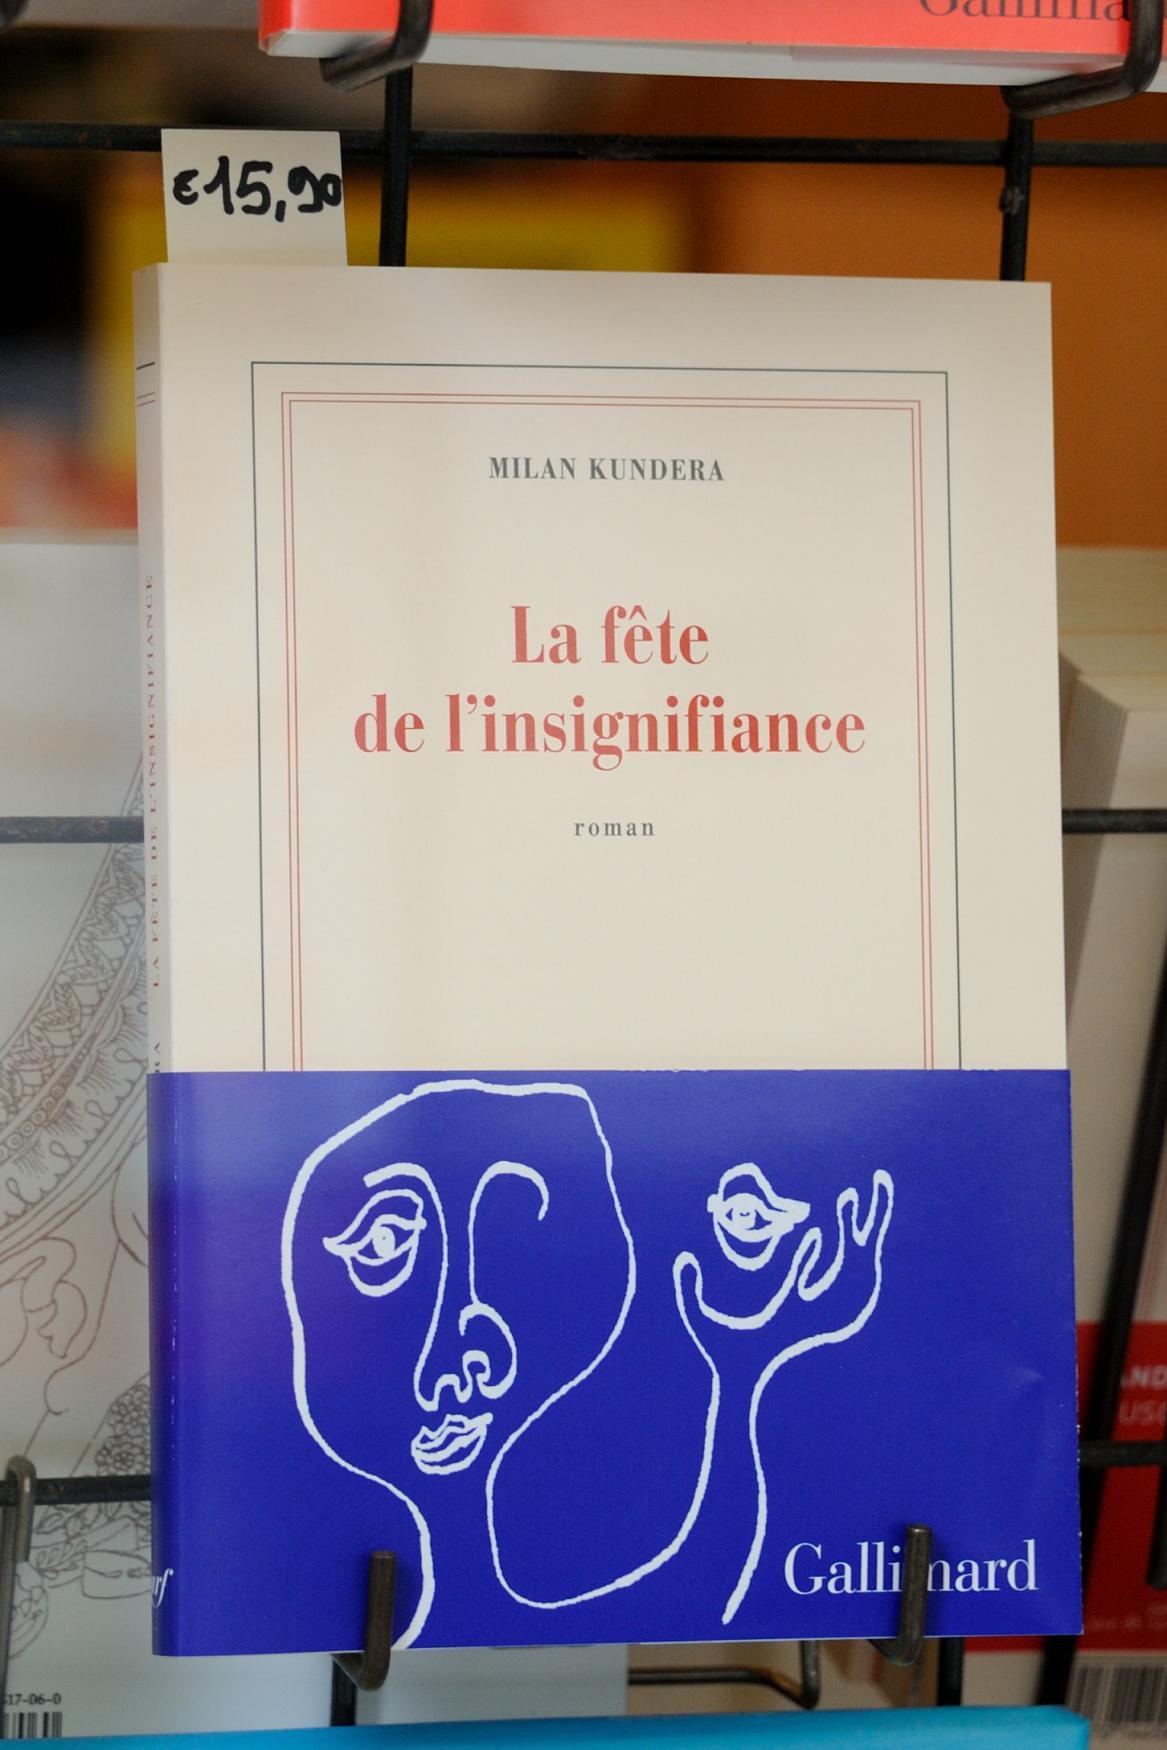 Milan Kundera / Oslava bezvýznamnosti